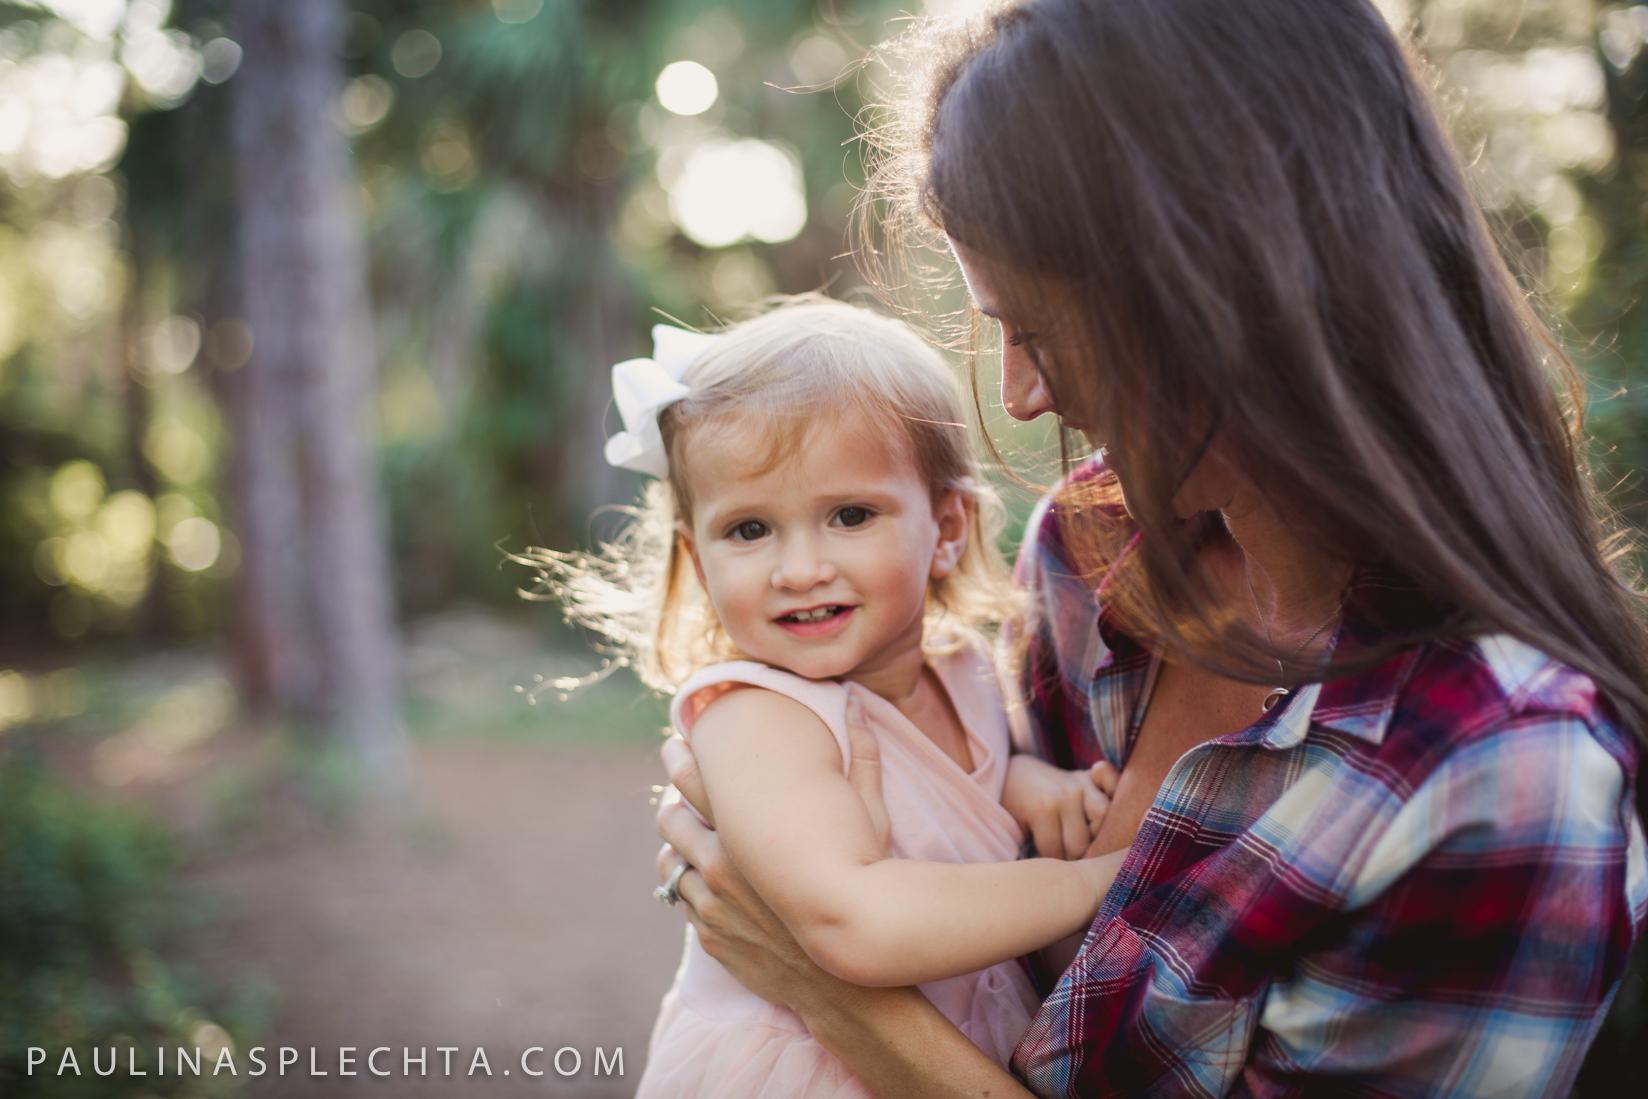 boca-raton-family-photography-photo-session-first-birthday-delray-beach-cake-smash-breastfeeding-la-leche-league-6.jpg